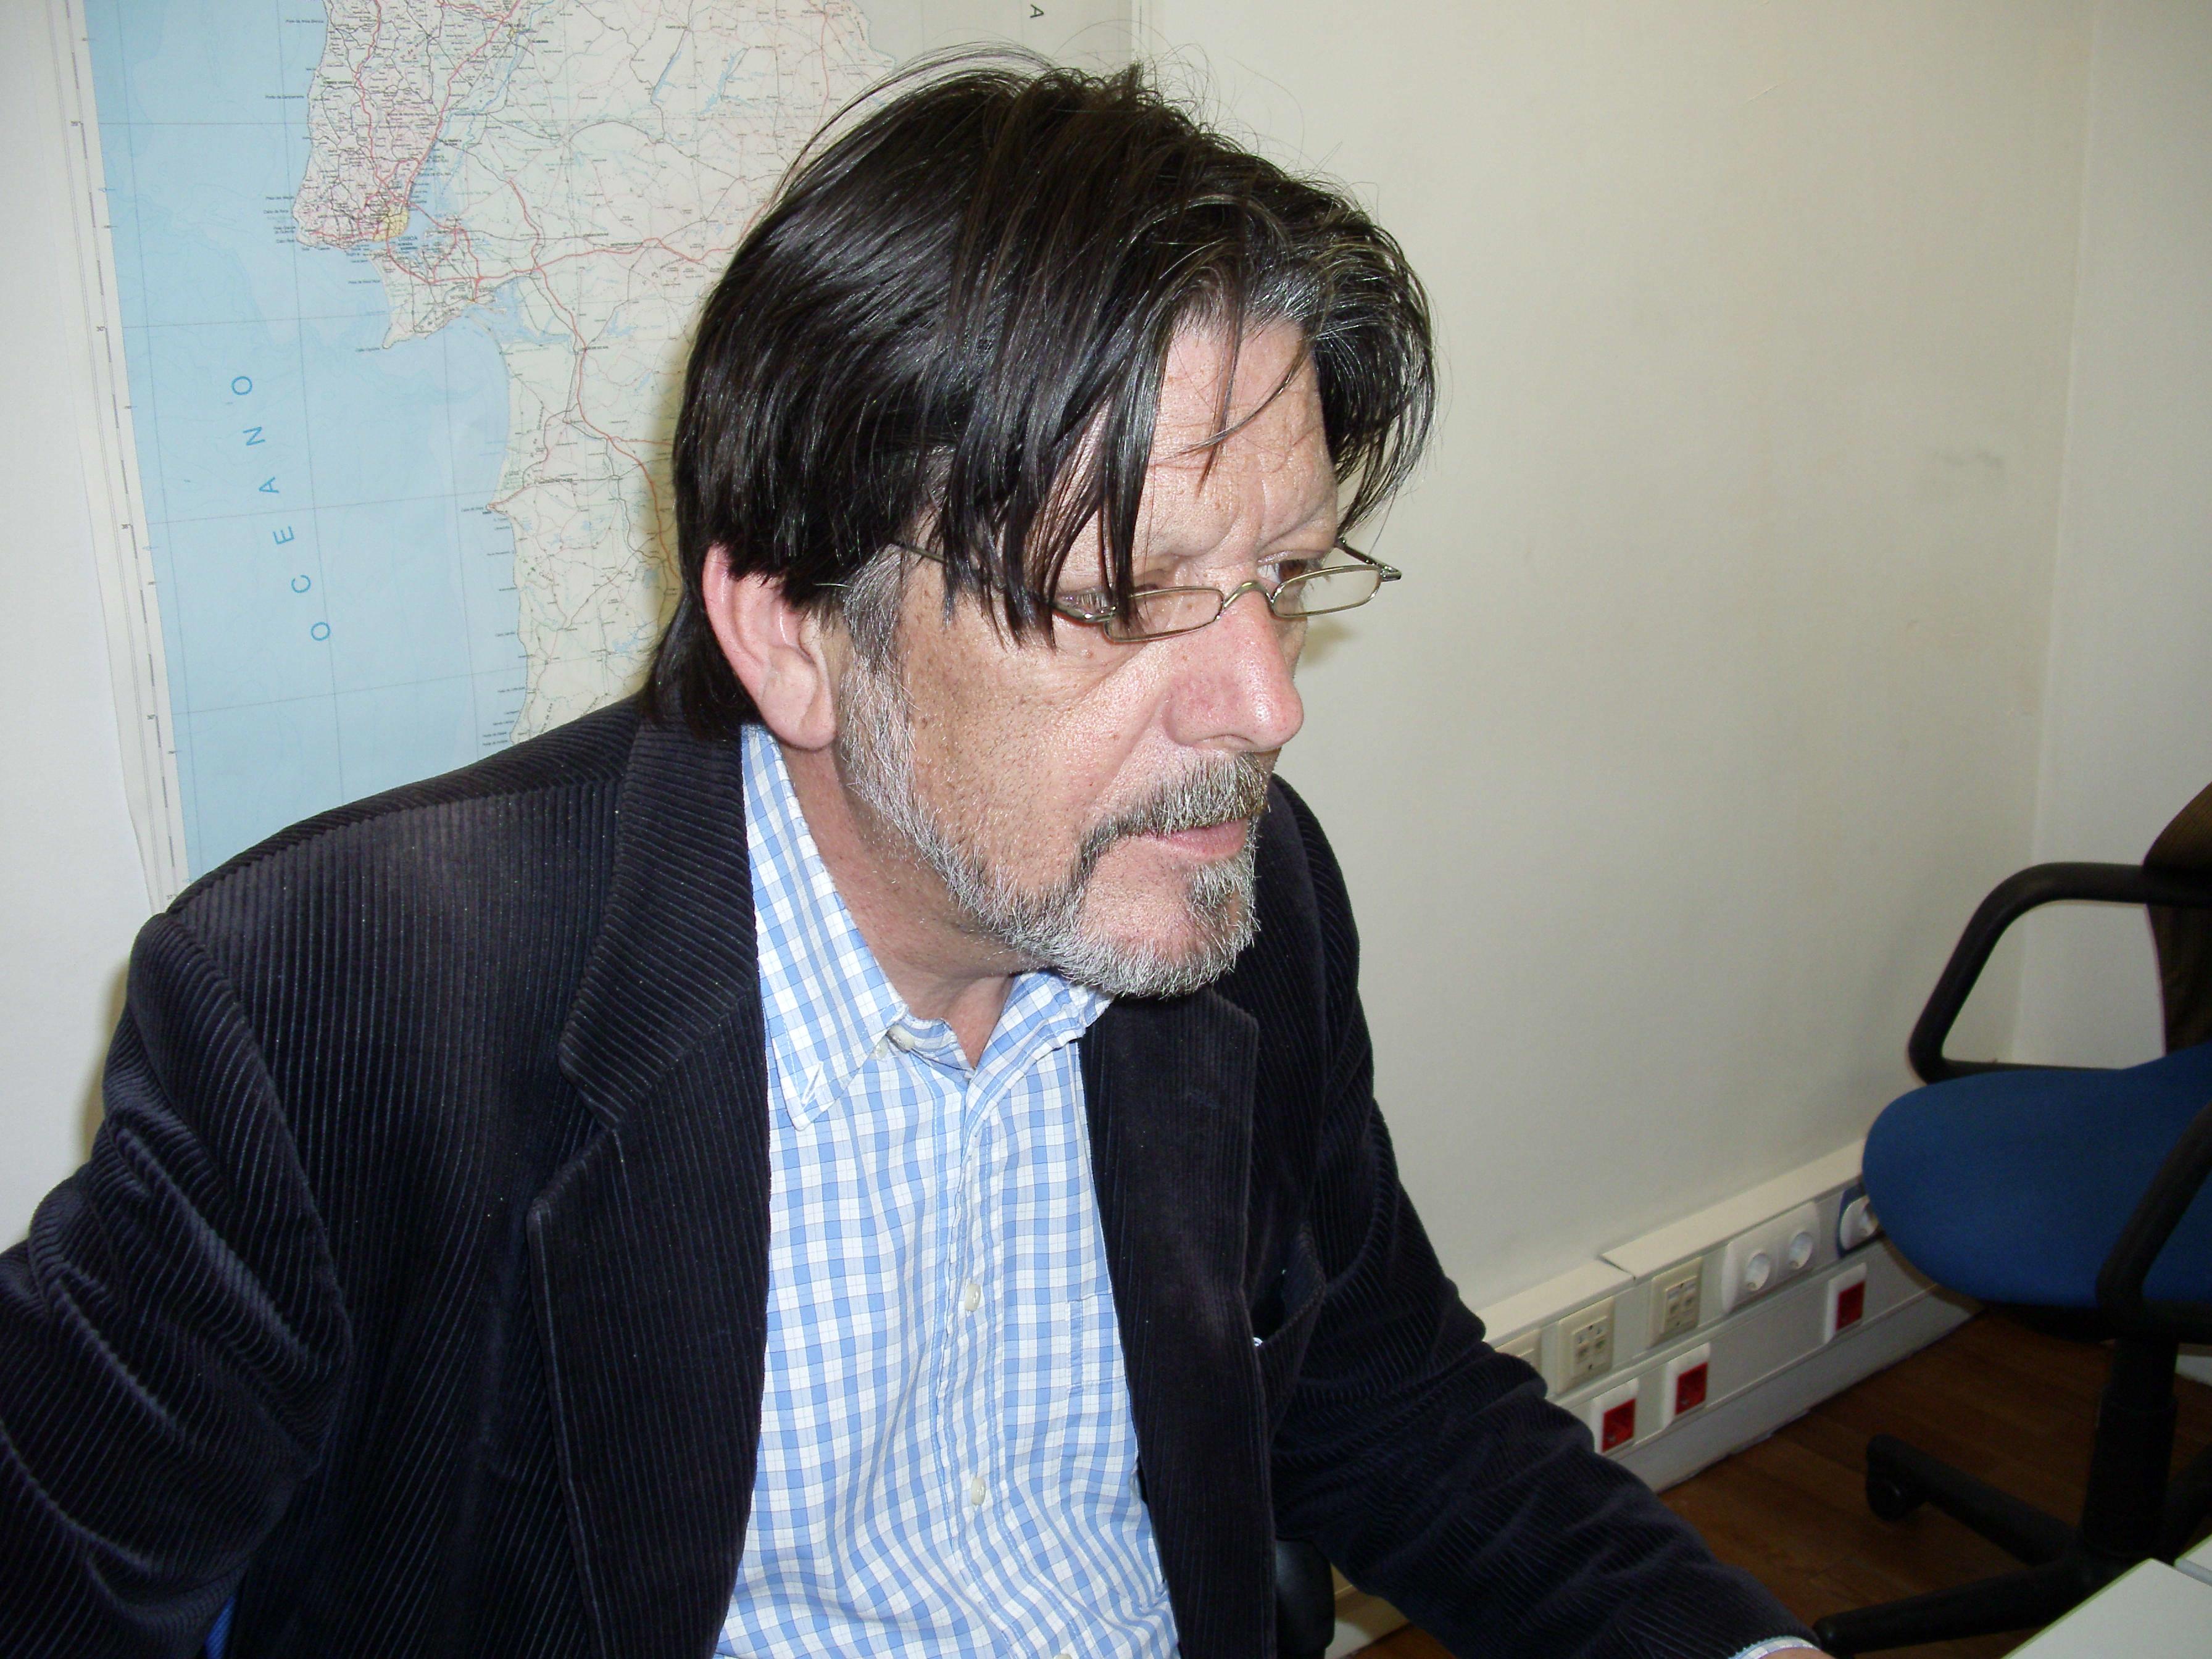 Diogo Cortez